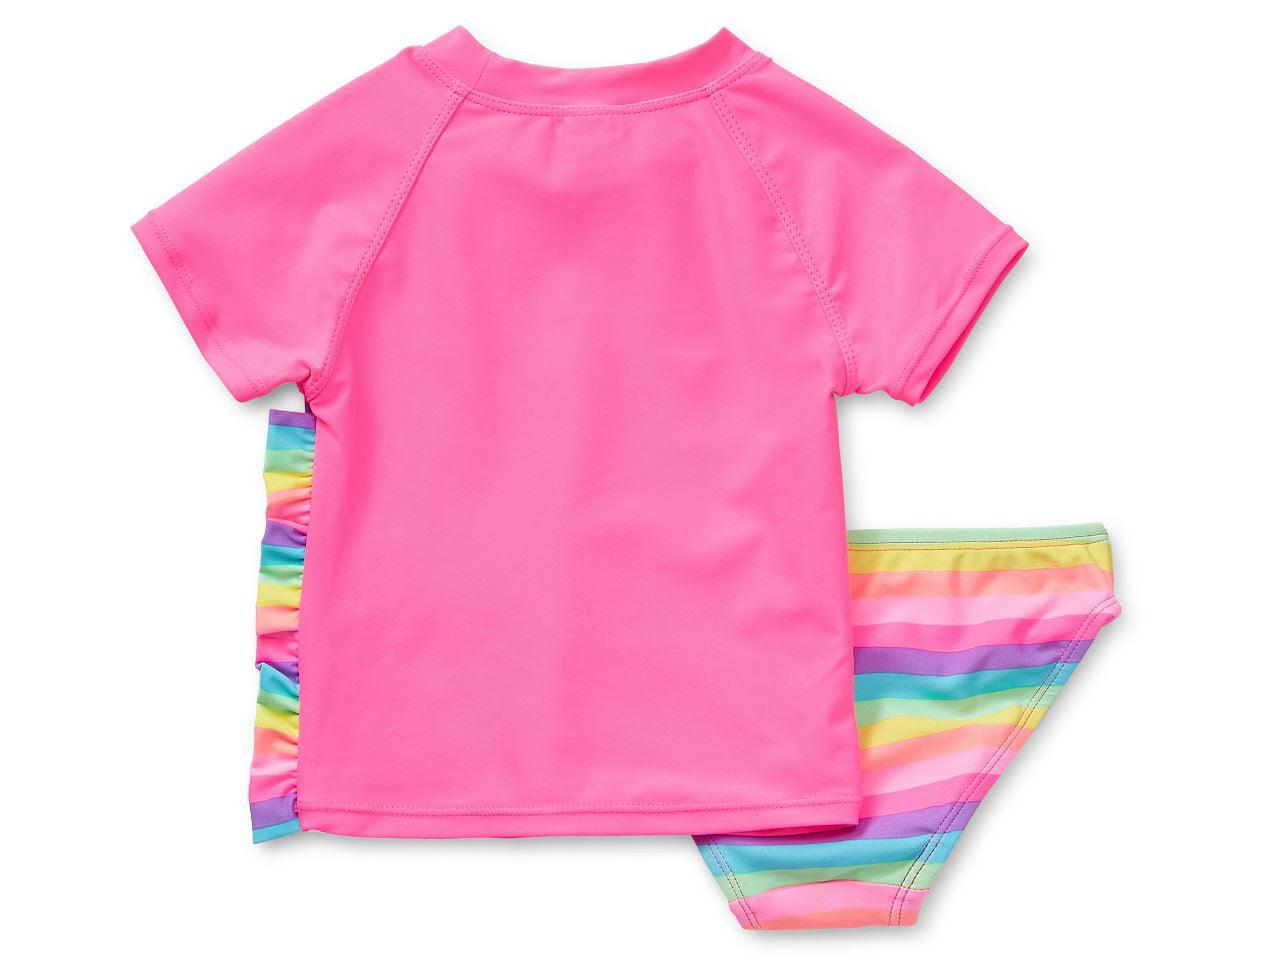 Okie Dokie Pattern Rash Guard Set Toddler Size 2T 3T 4T New